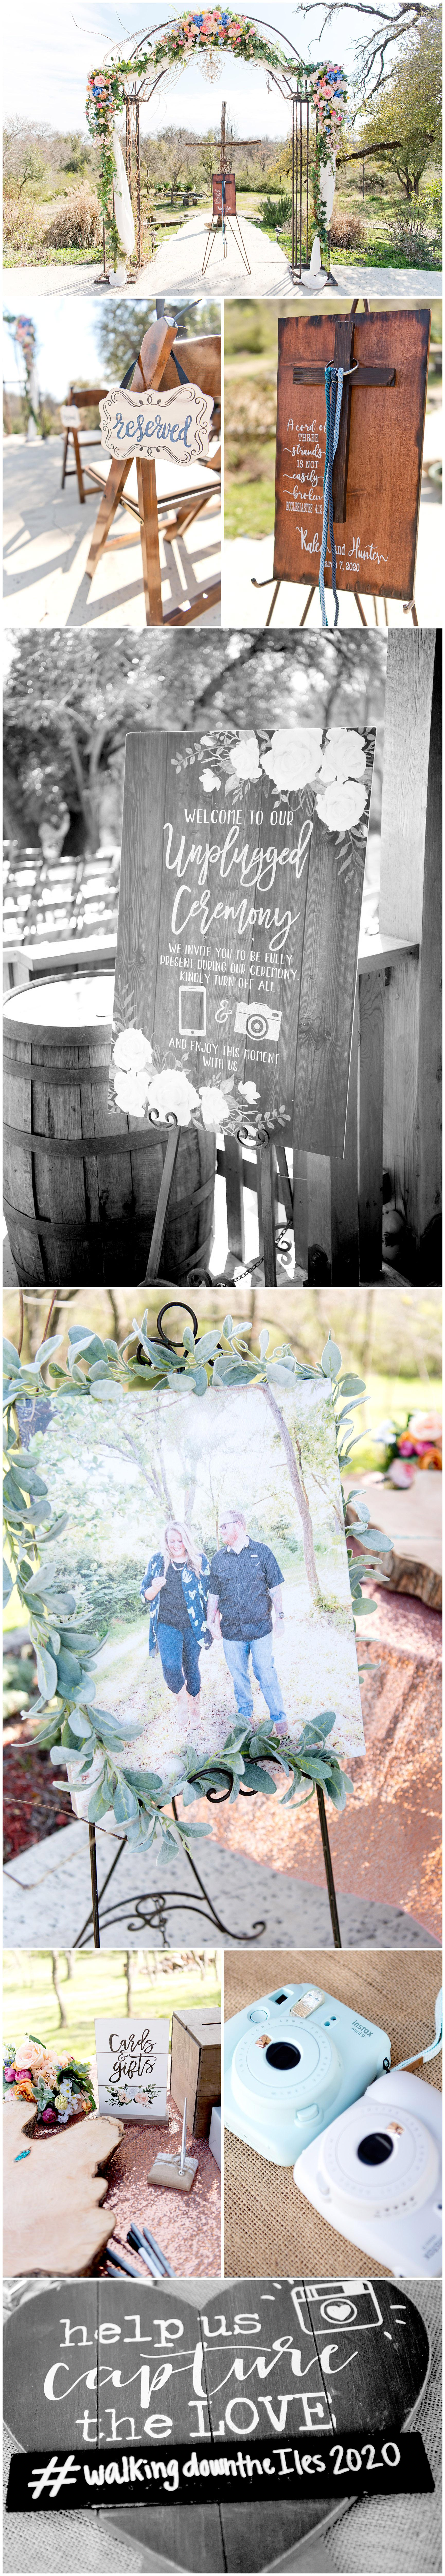 Hidden Gardens Wedding Venue Fort Worth Texas